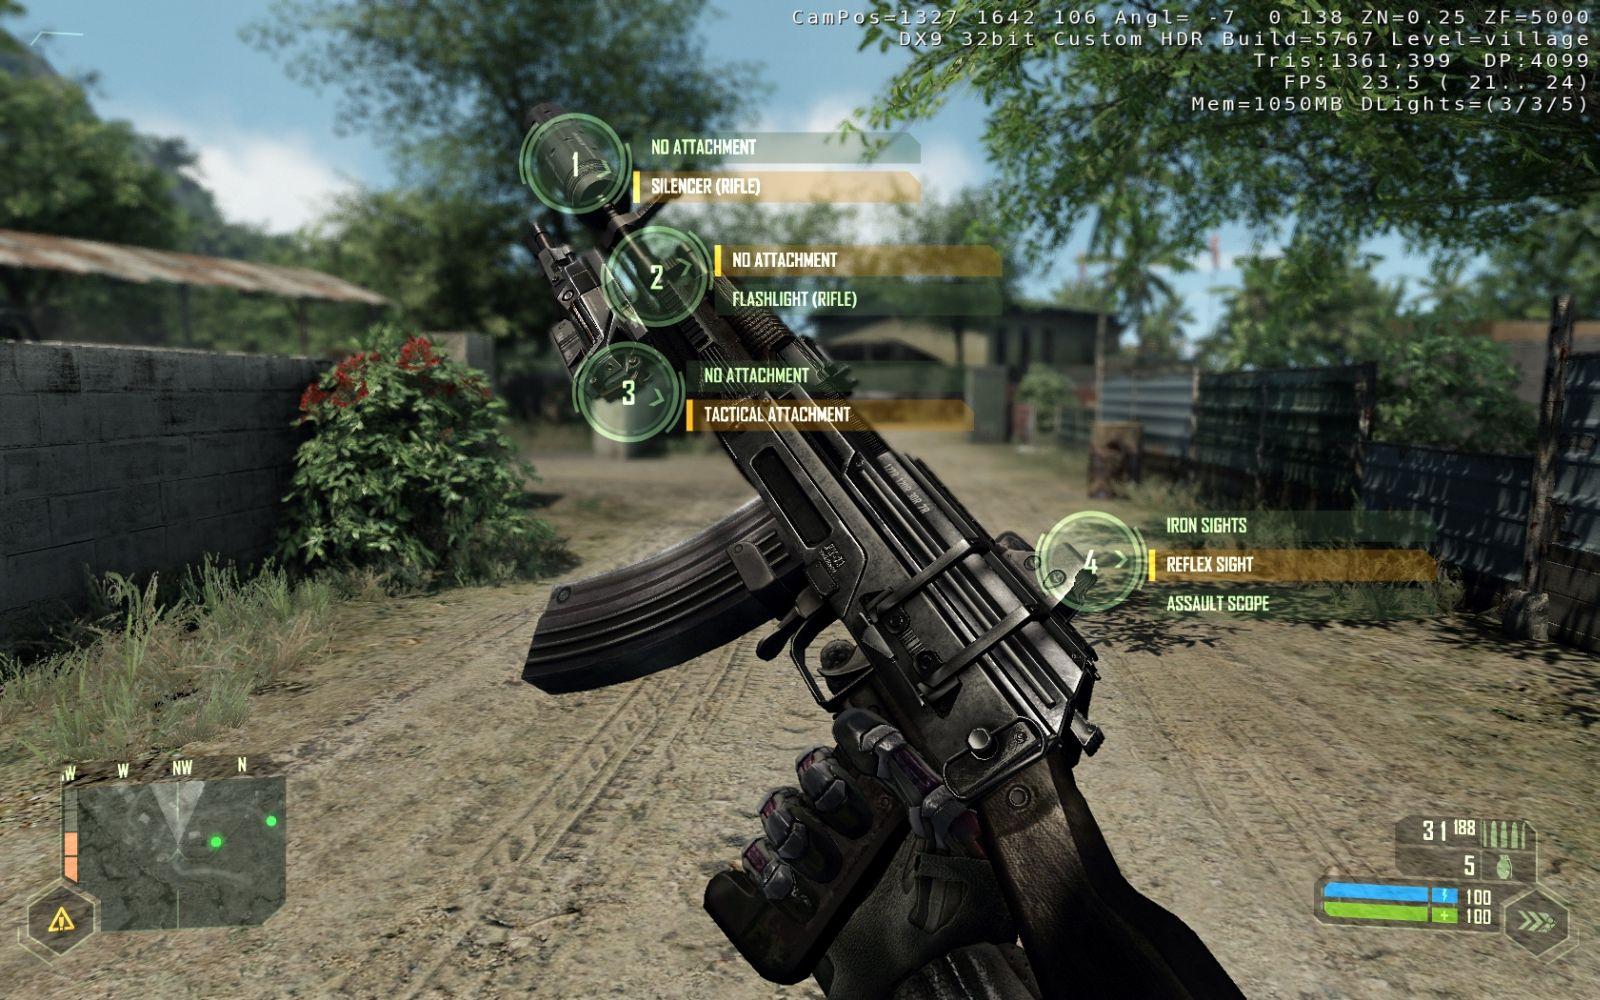 HALO GAMES Online - Play Free Halo Games on Poki